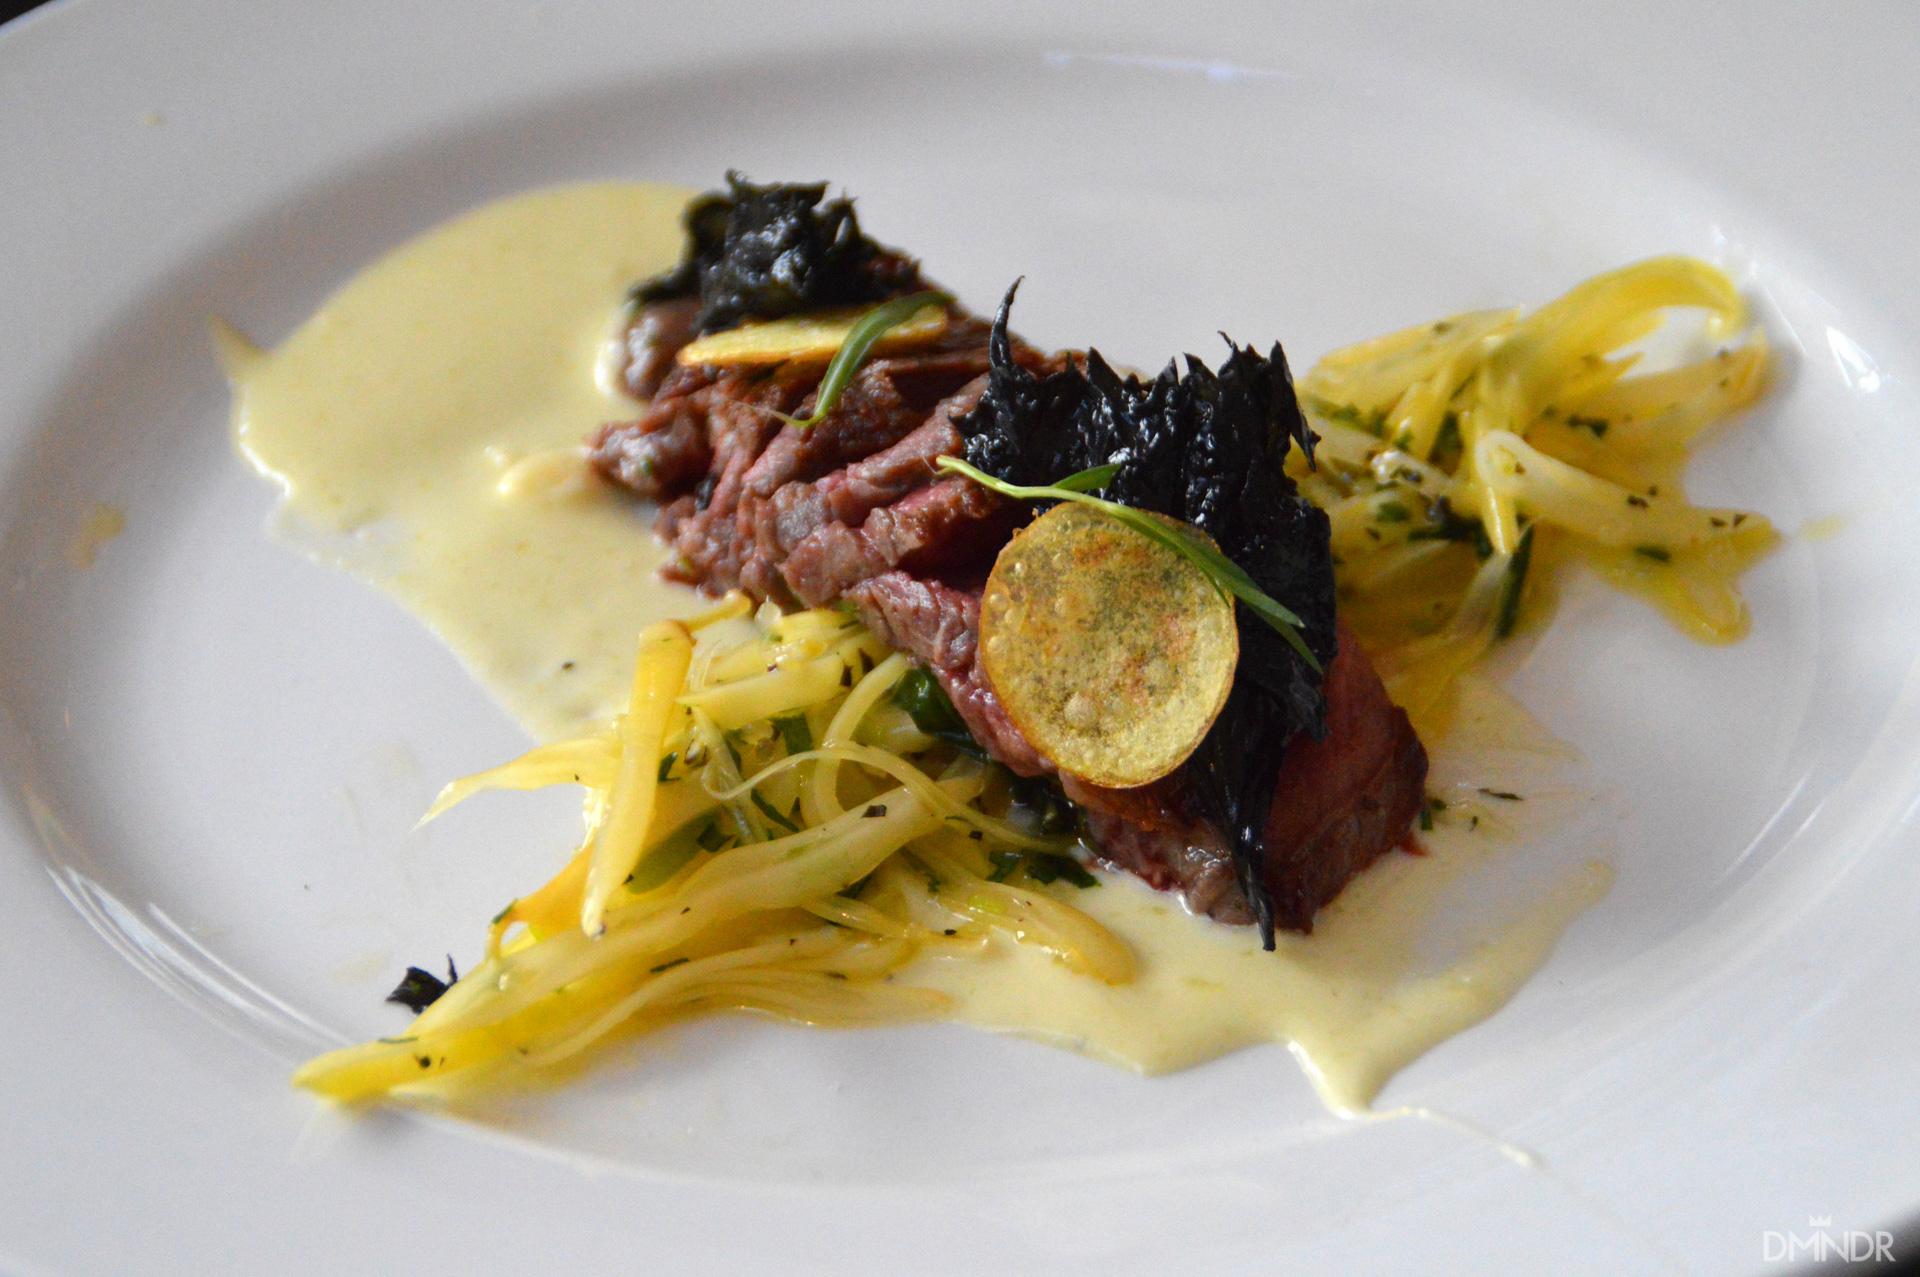 The Winnning Dish (Water Buffalo Steak, other secret ingredients were Elk and Coho Salmon)